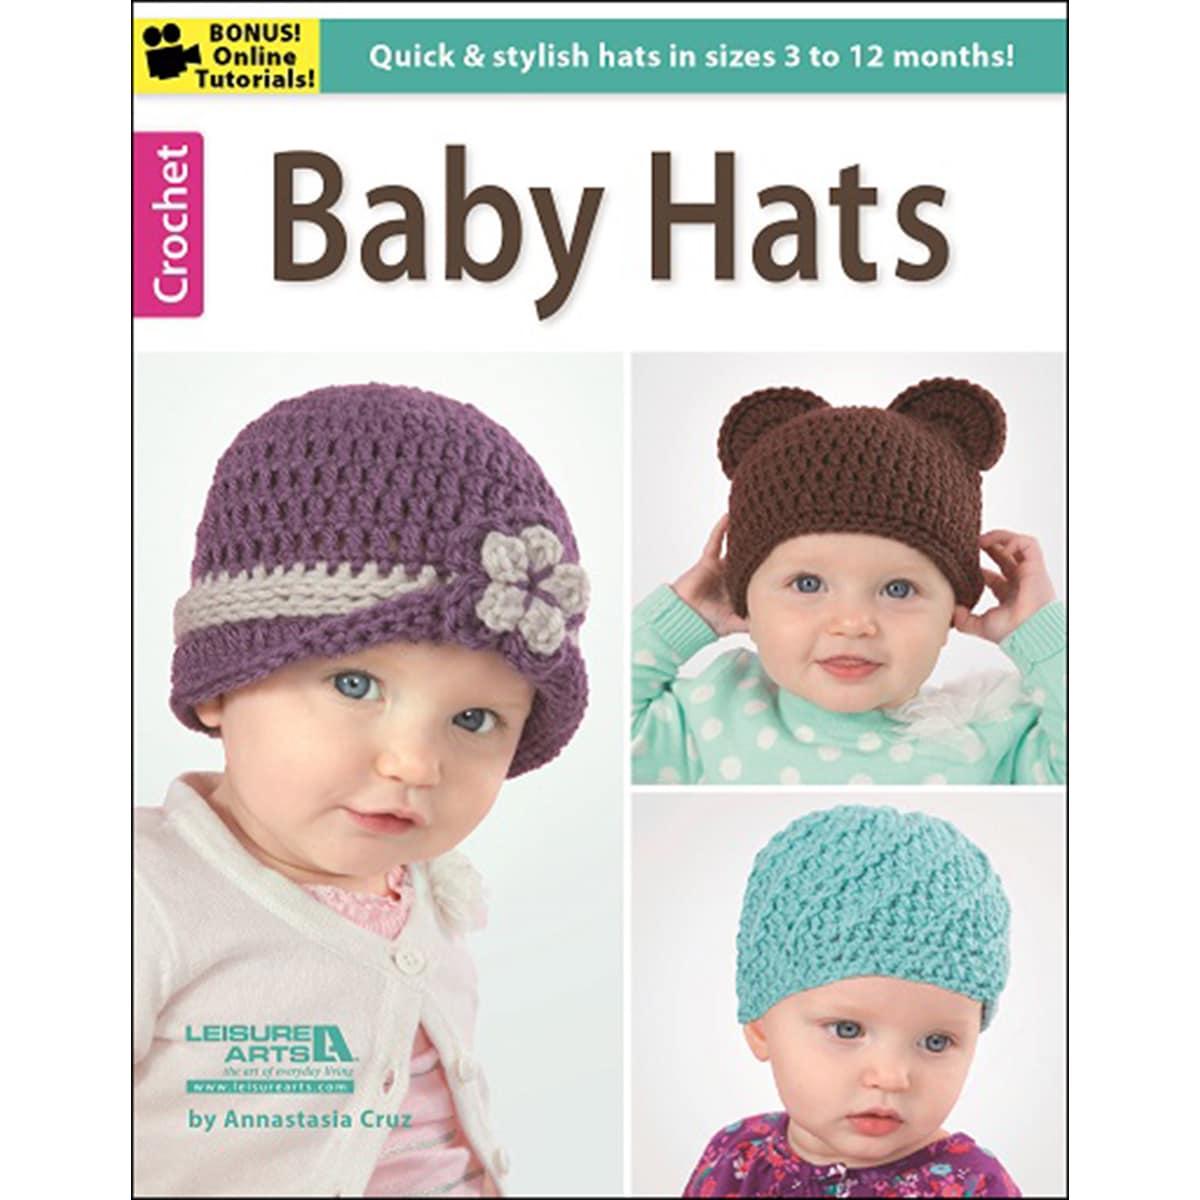 Leisure Arts-Crochet: Baby Hats (Crochet: Baby Hats), Clear